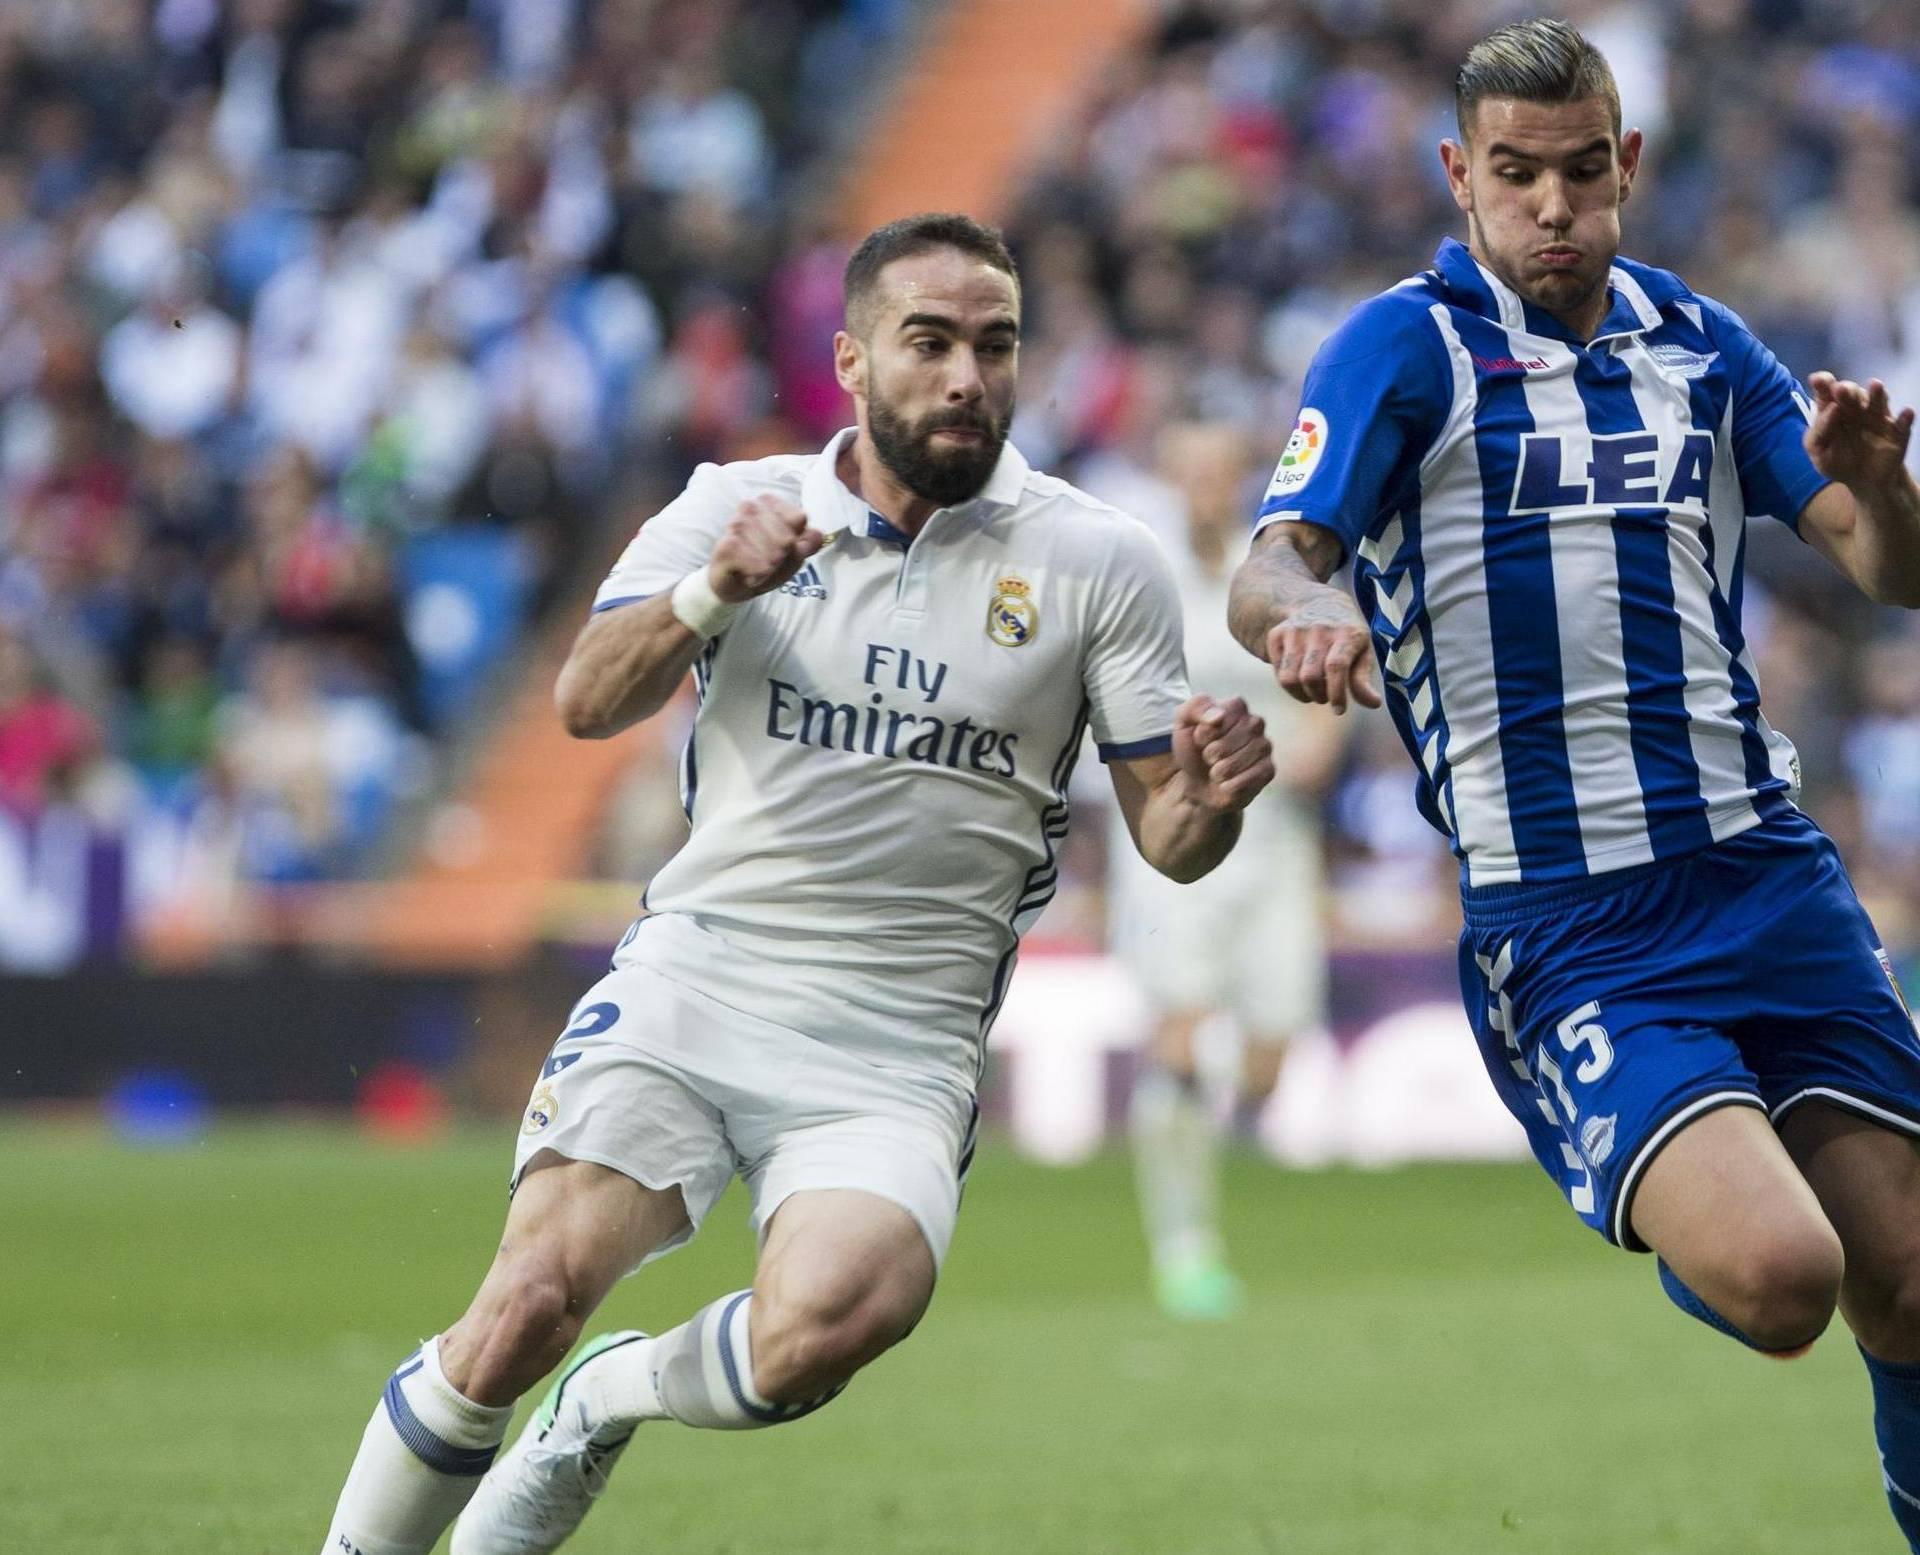 La Liga between Real Madrid and Deportivo Alaves at Bernabeu Stadium Stadium